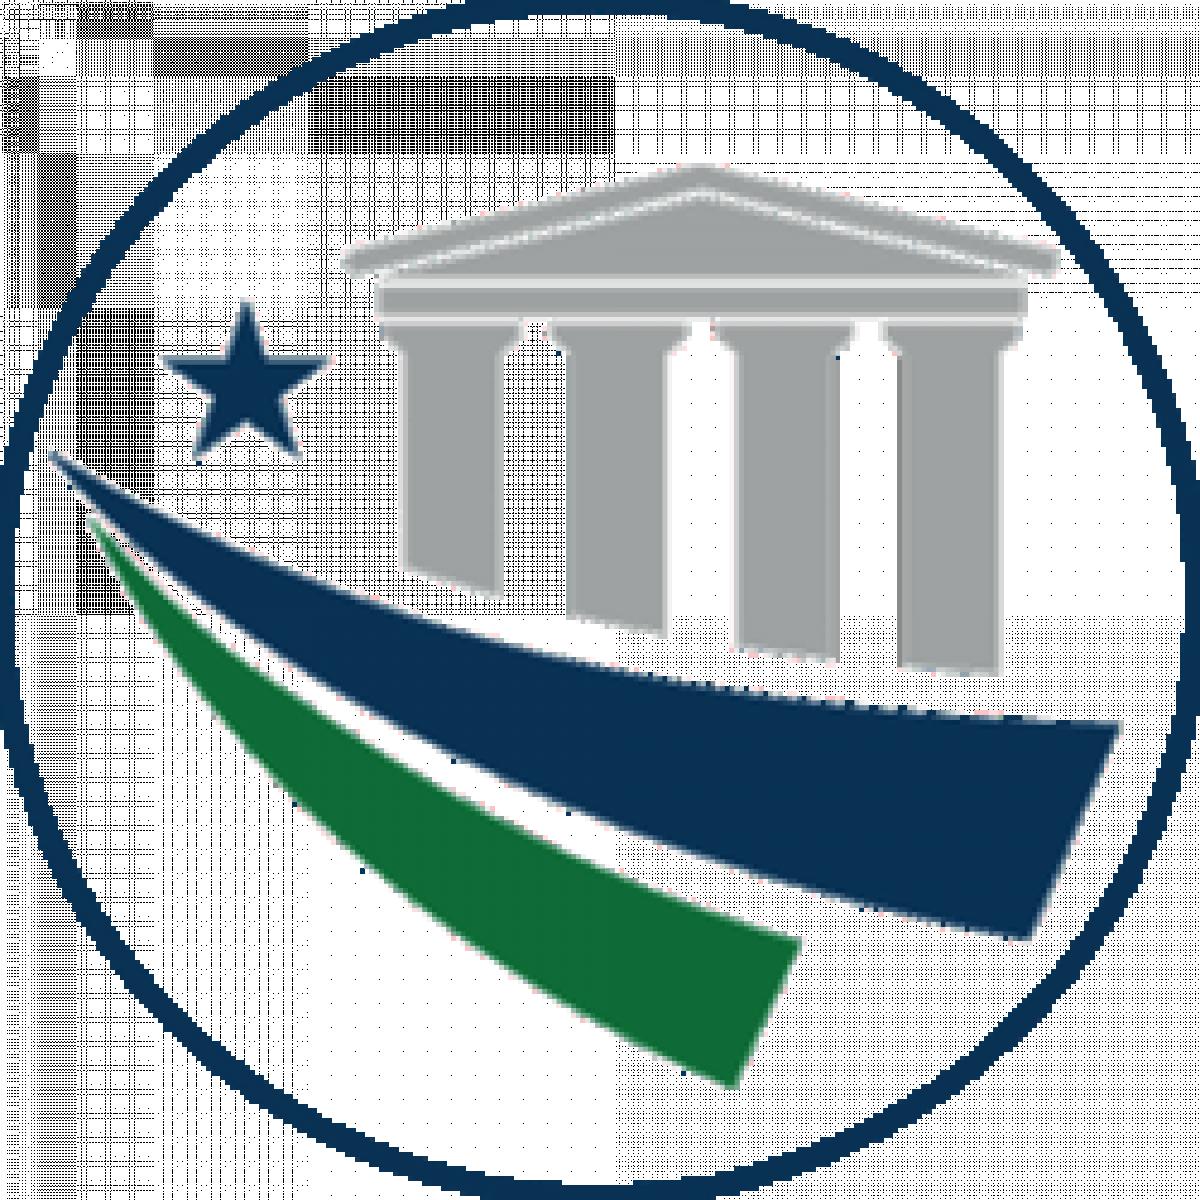 Bureau of the Fiscal Service Logo